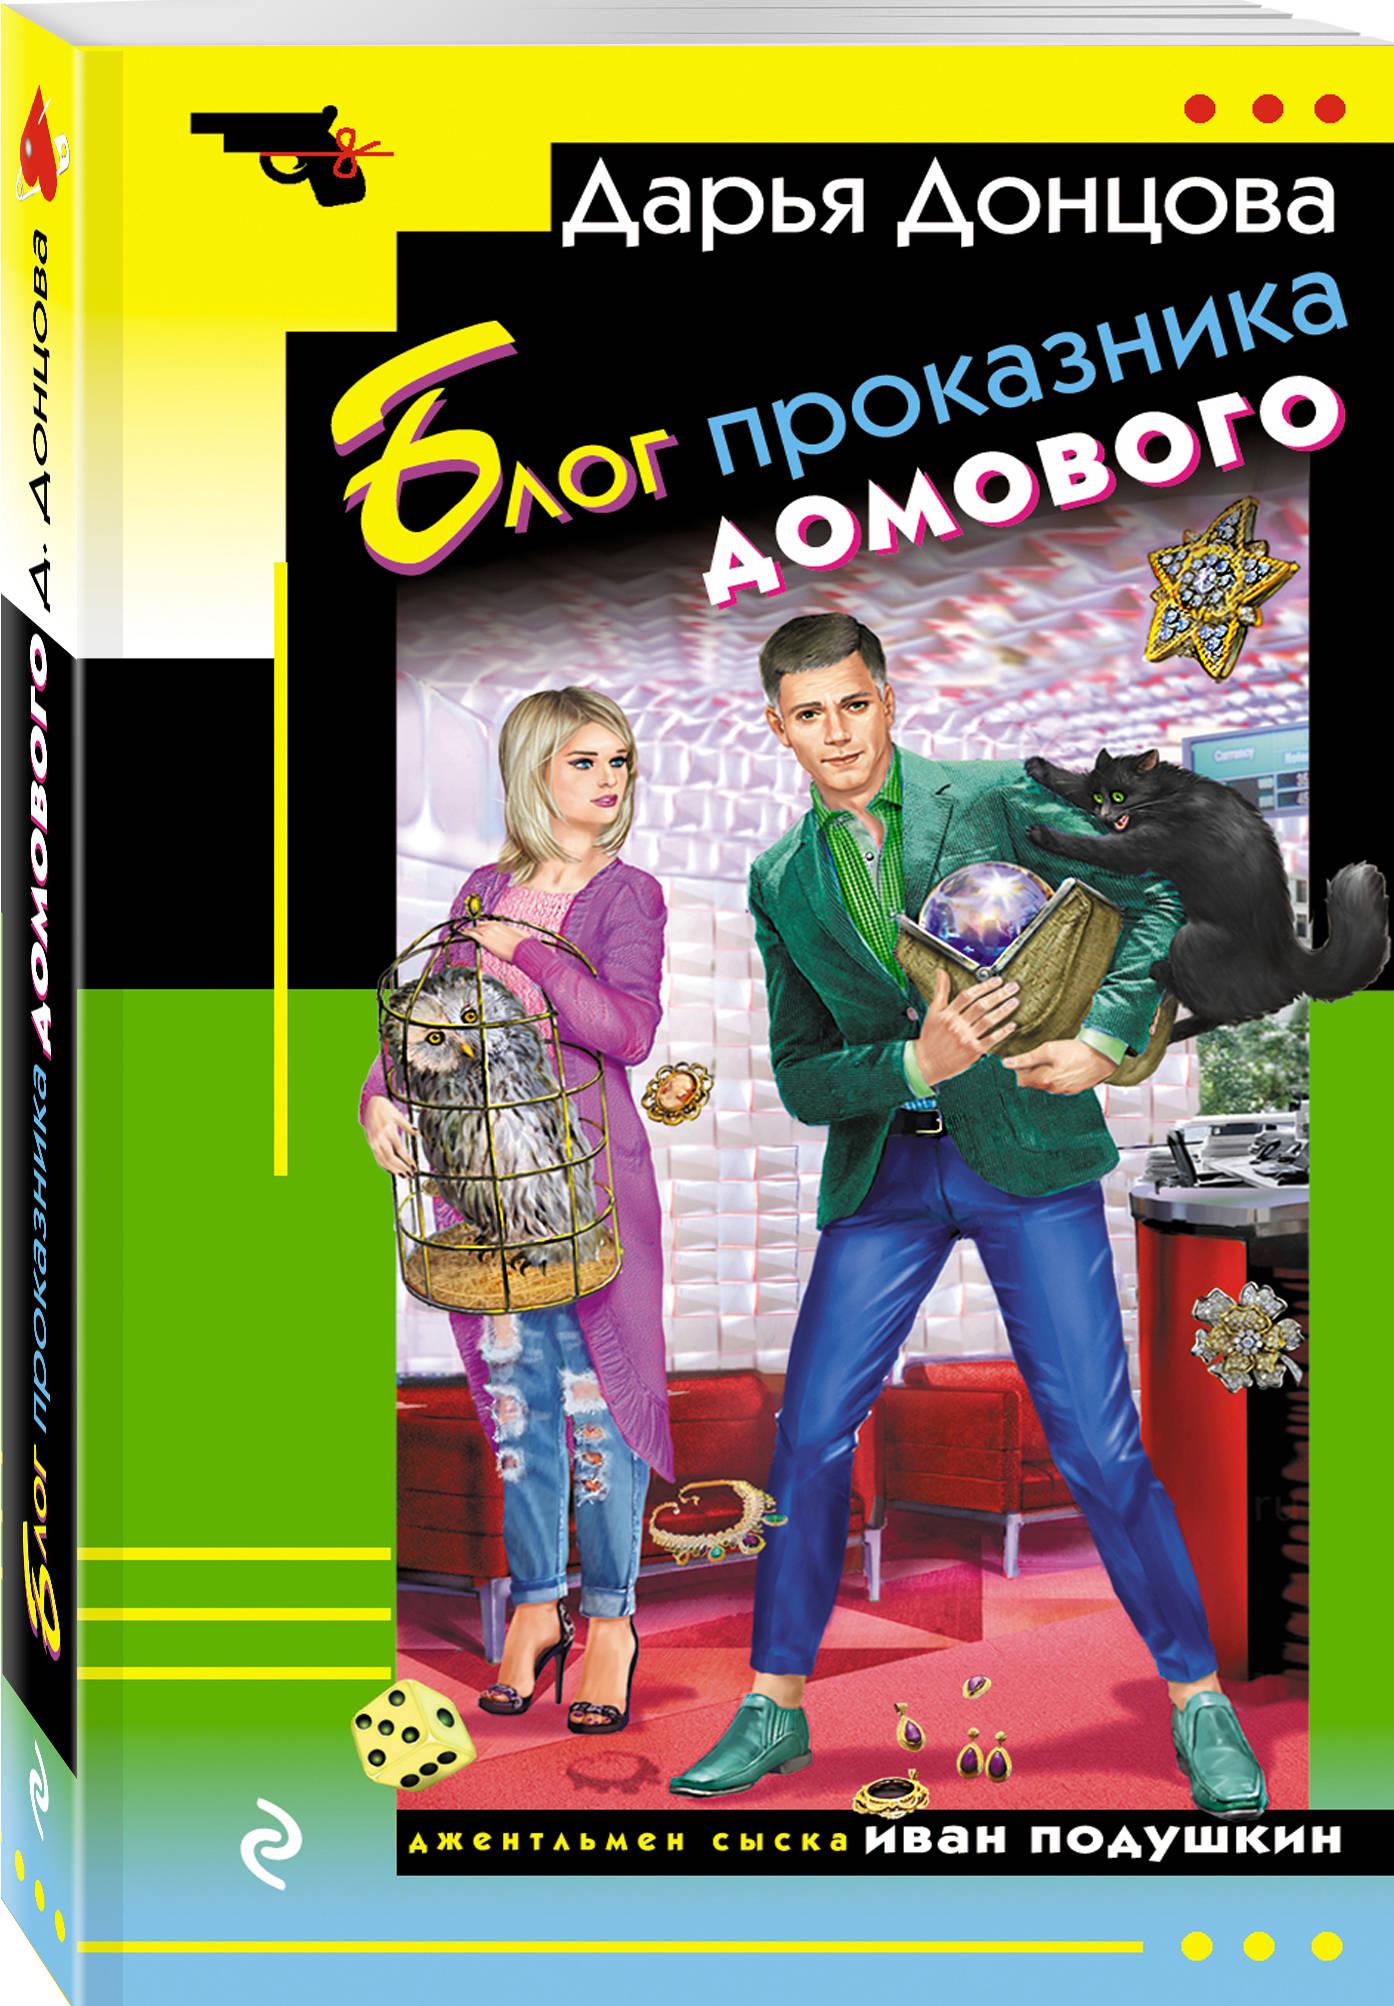 Донцова Дарья Аркадьевна Блог проказника домового